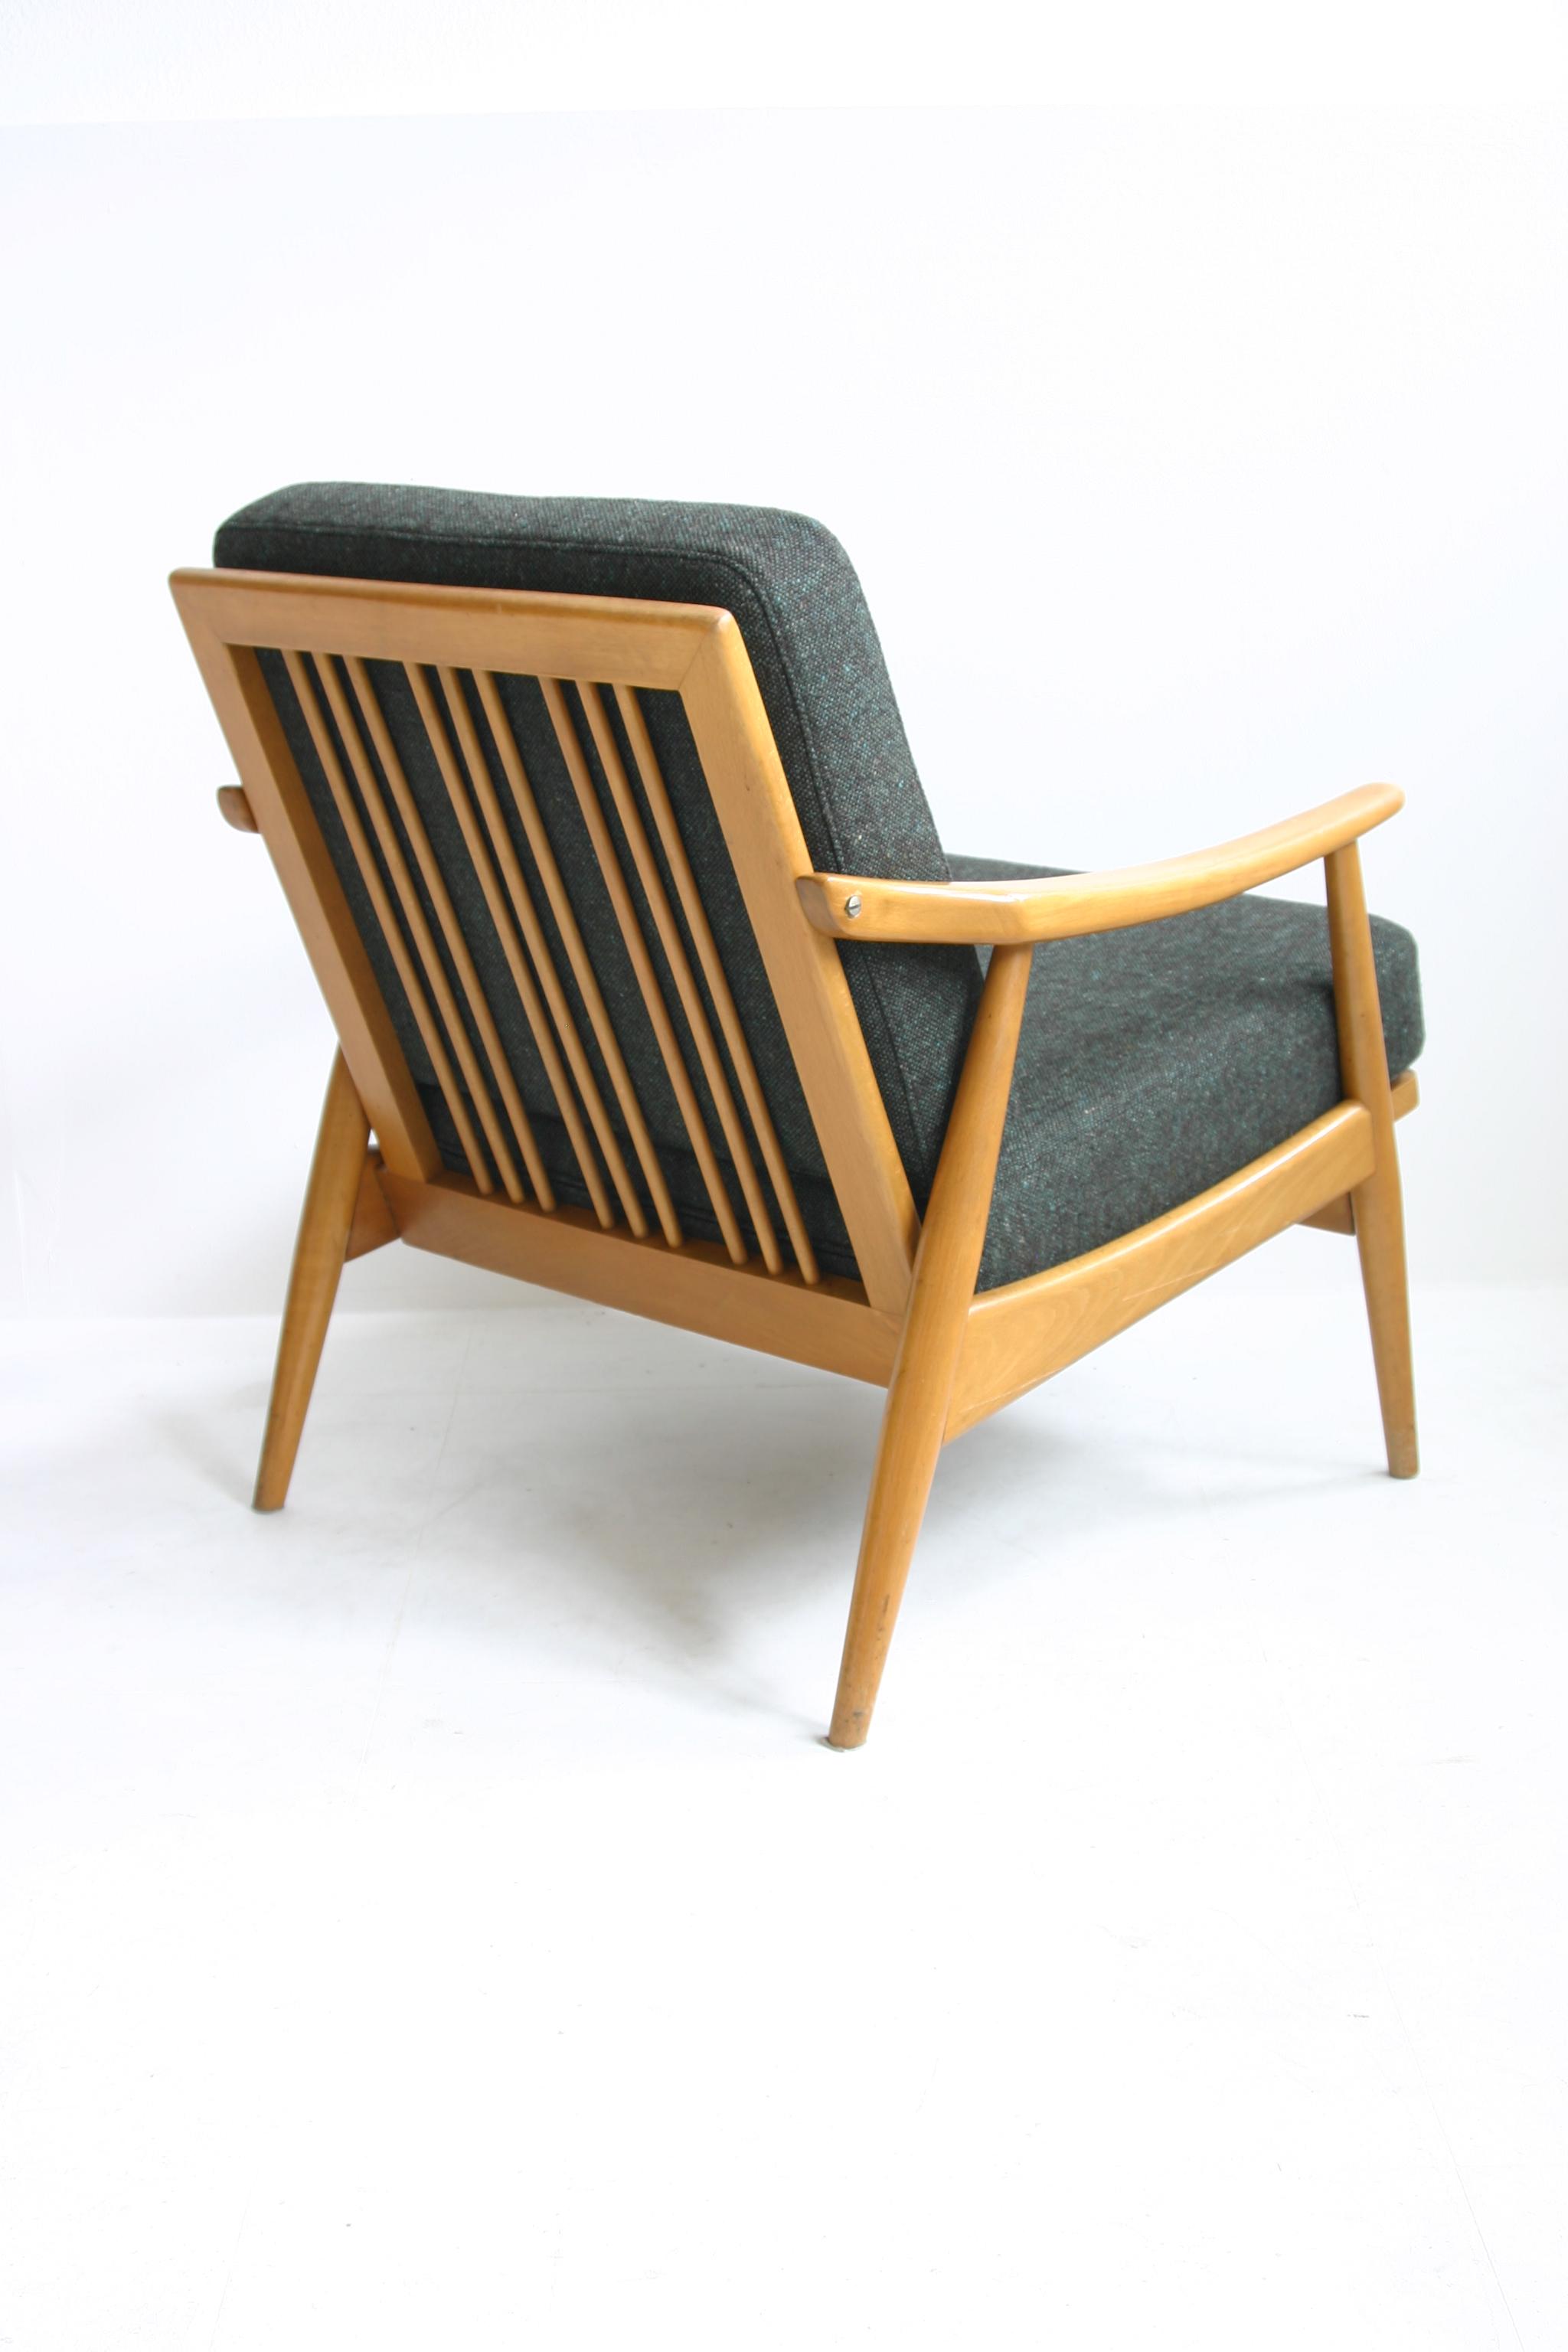 Beechwood Lounge Chair SOLD